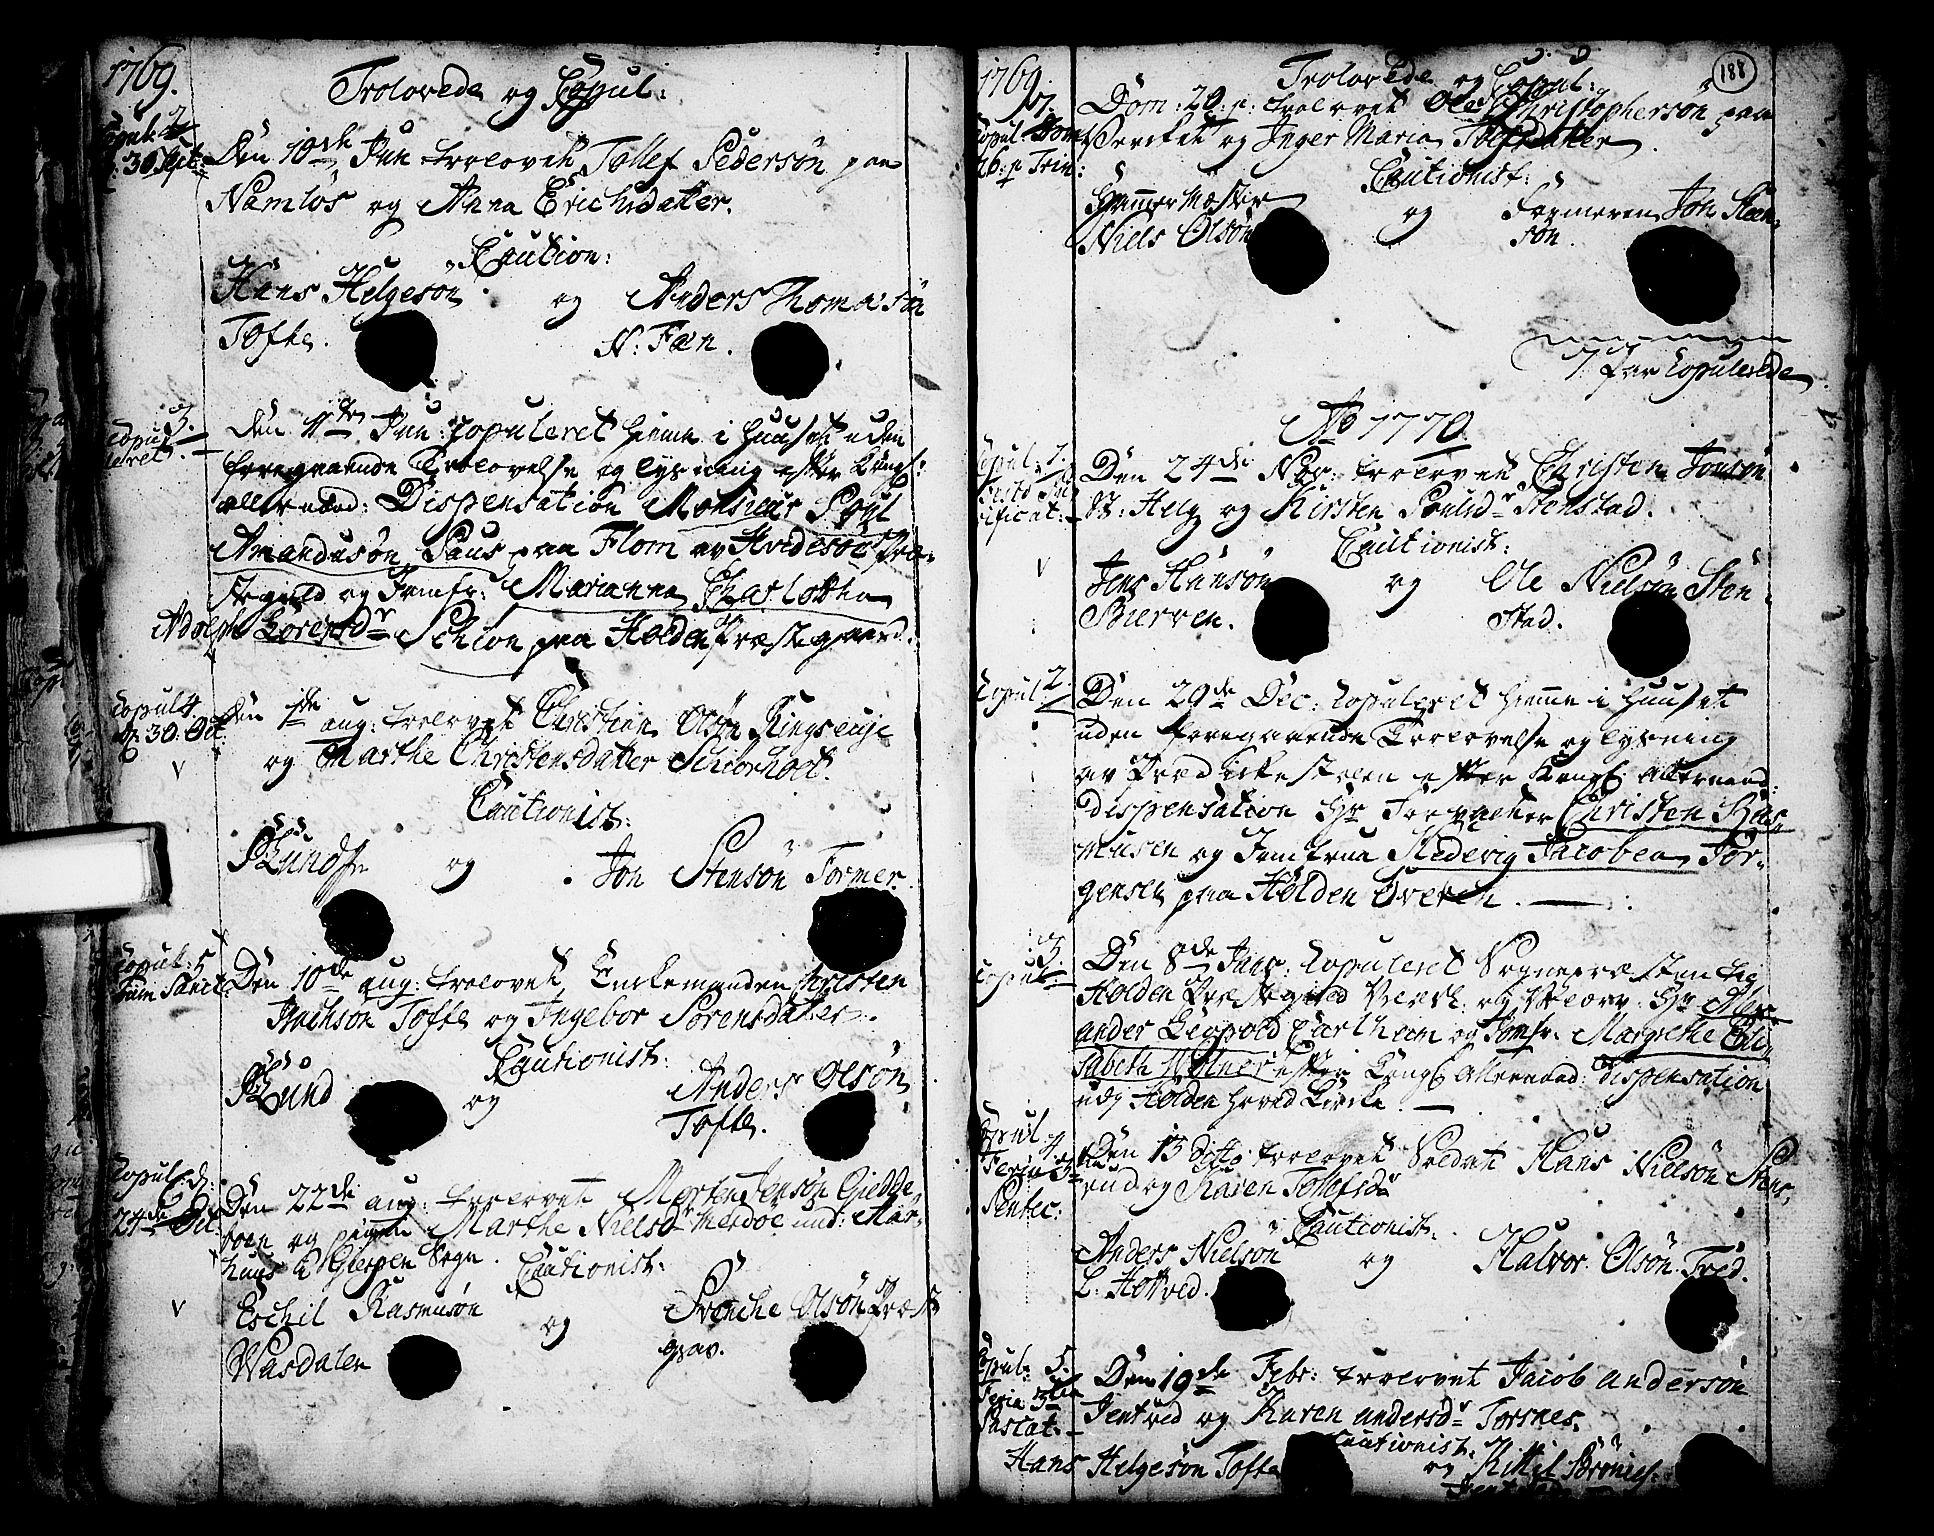 SAKO, Holla kirkebøker, F/Fa/L0001: Ministerialbok nr. 1, 1717-1779, s. 188